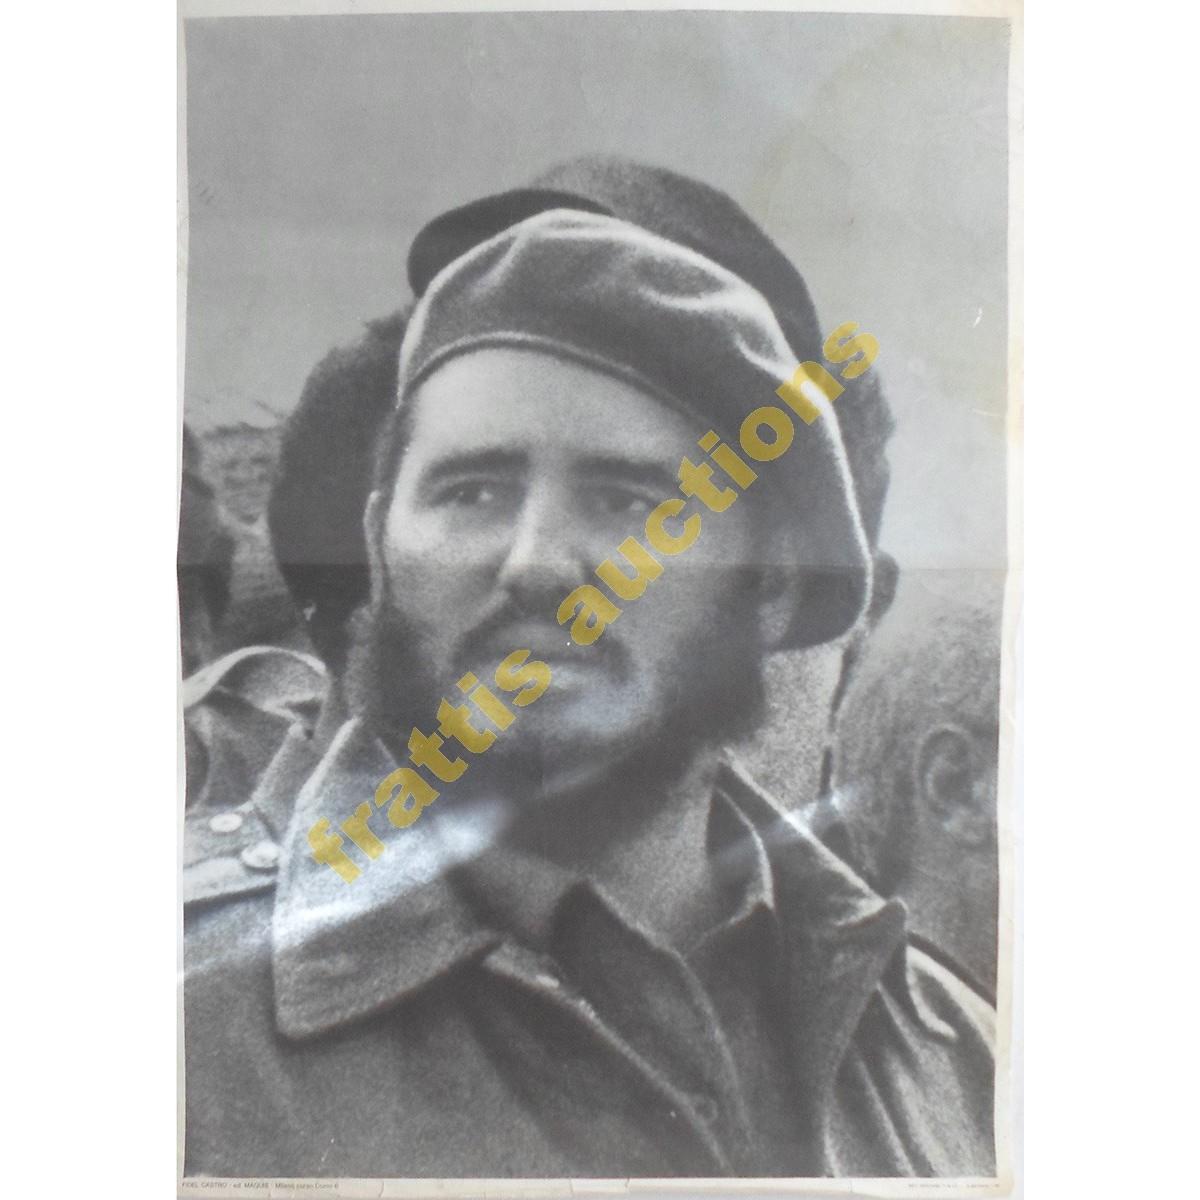 Fidel Castro, χάρτινη αφίσα.